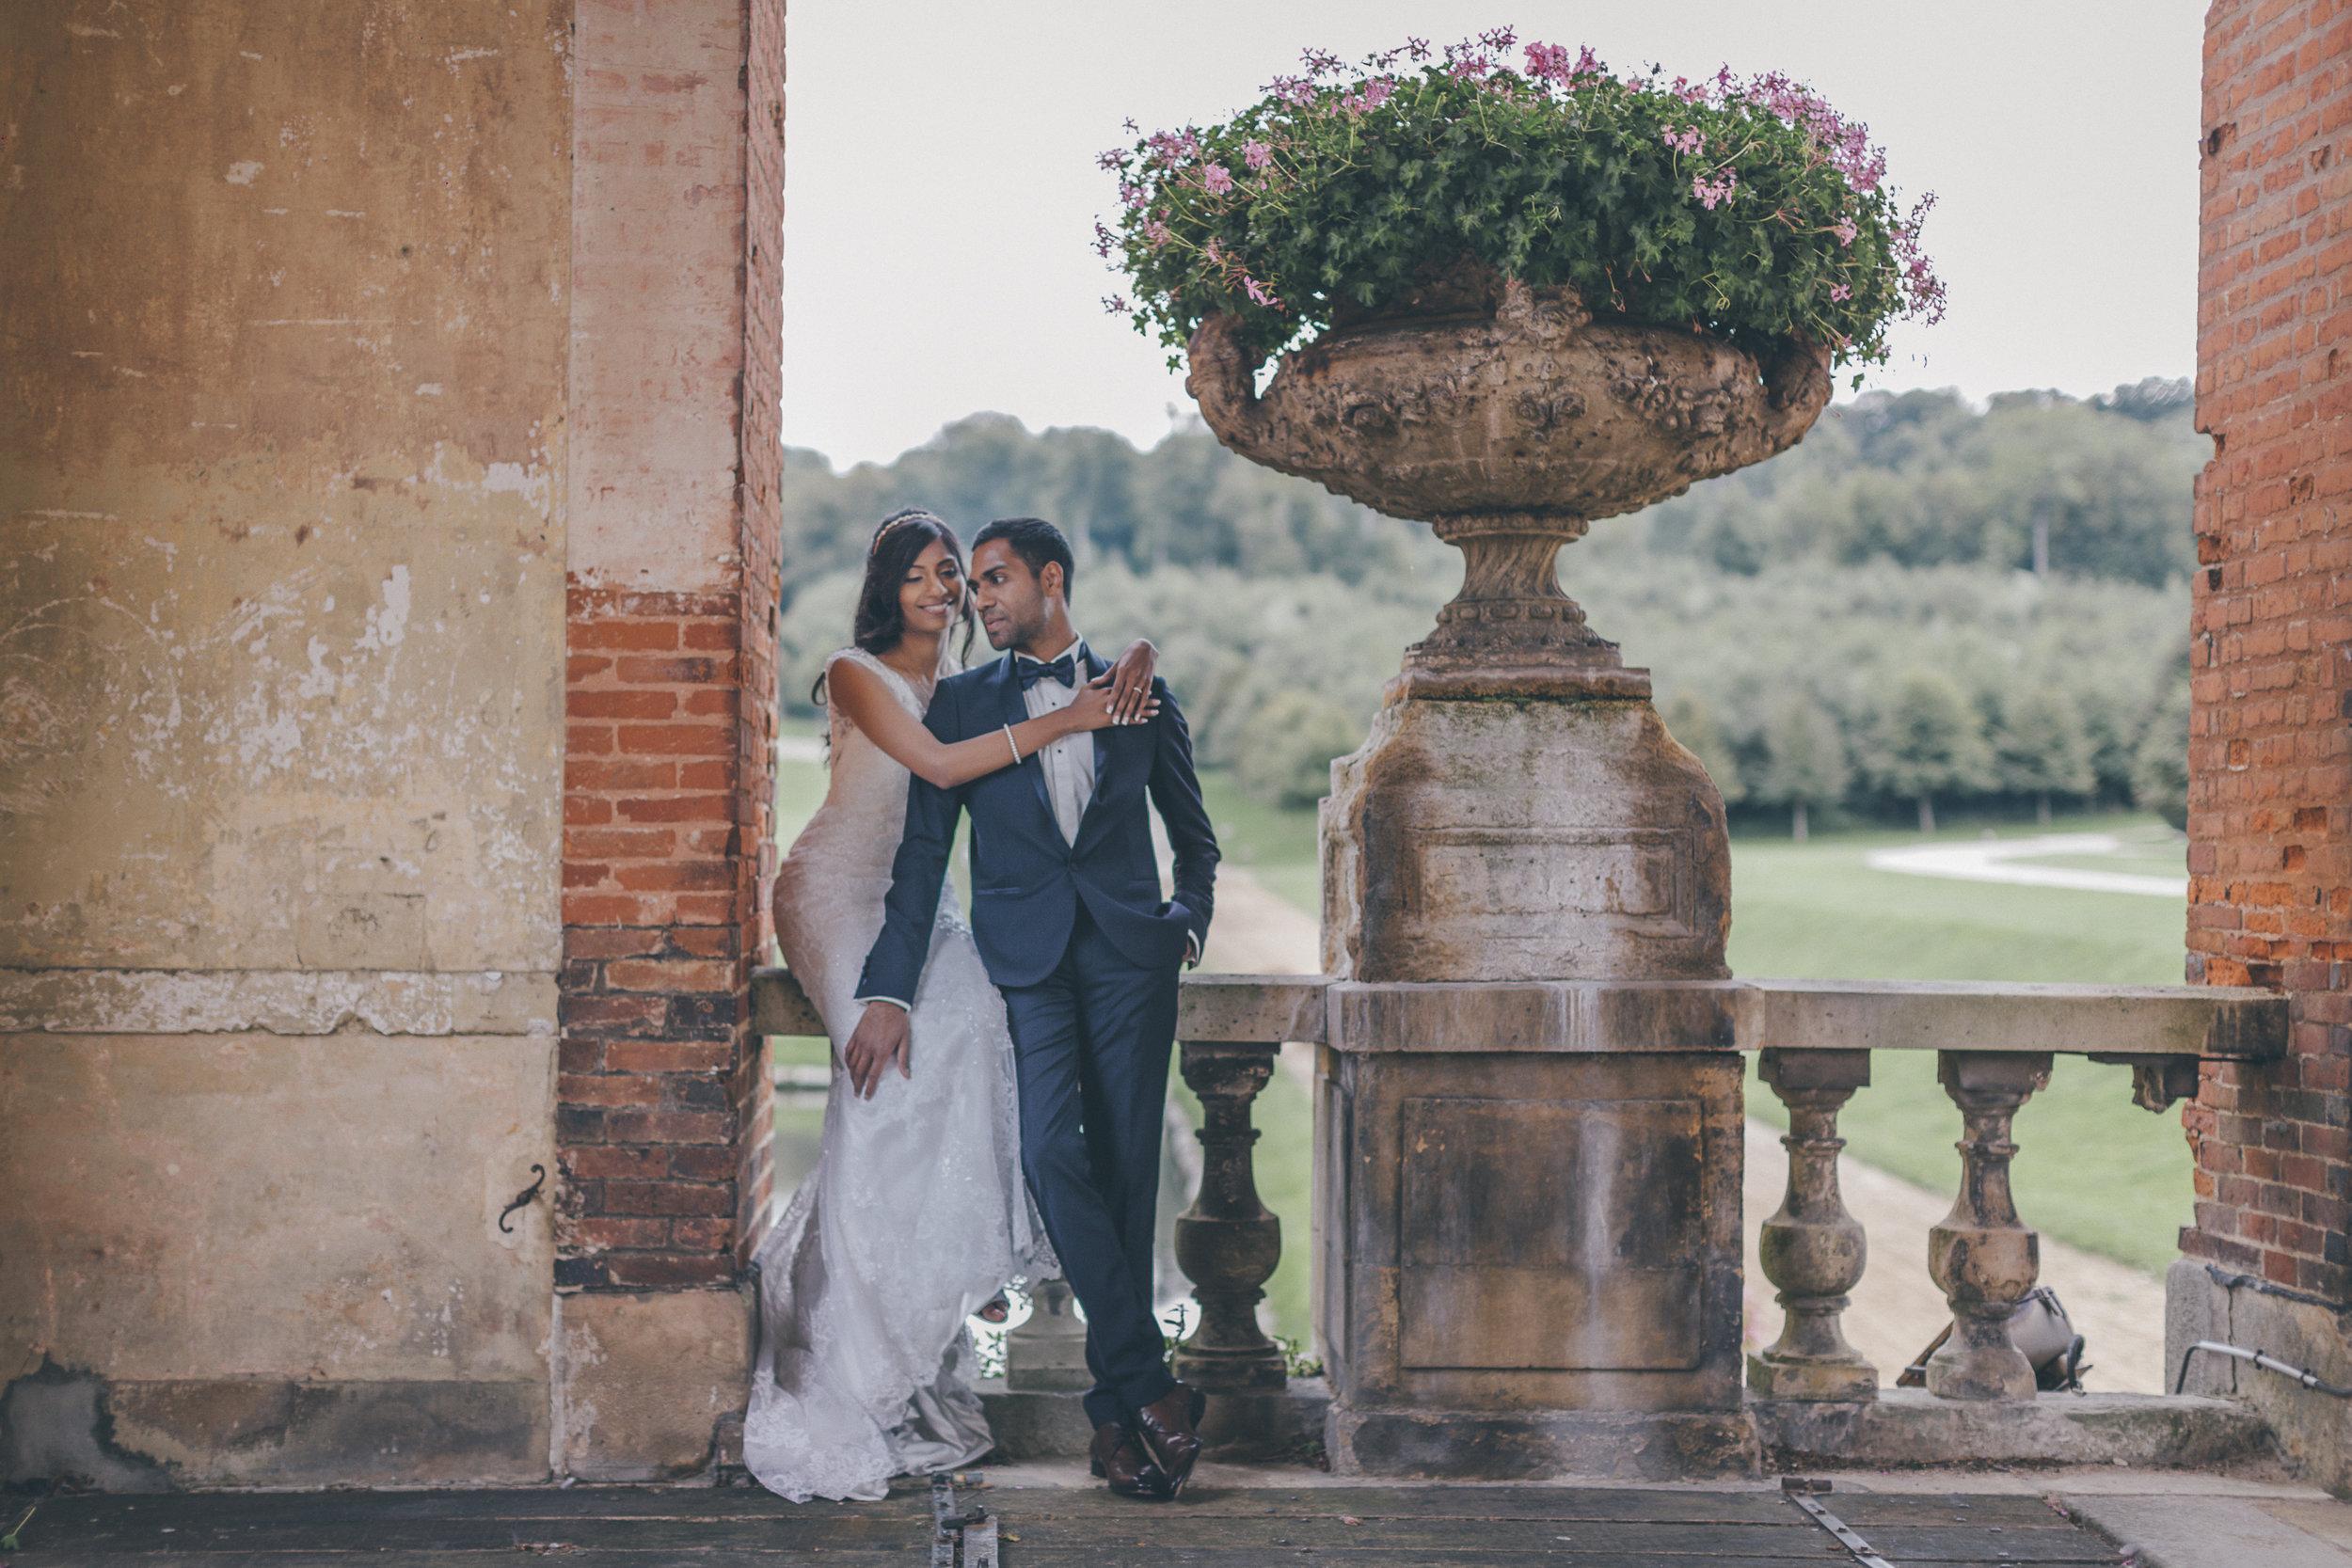 Oumou & Rizvan - Wedding in France